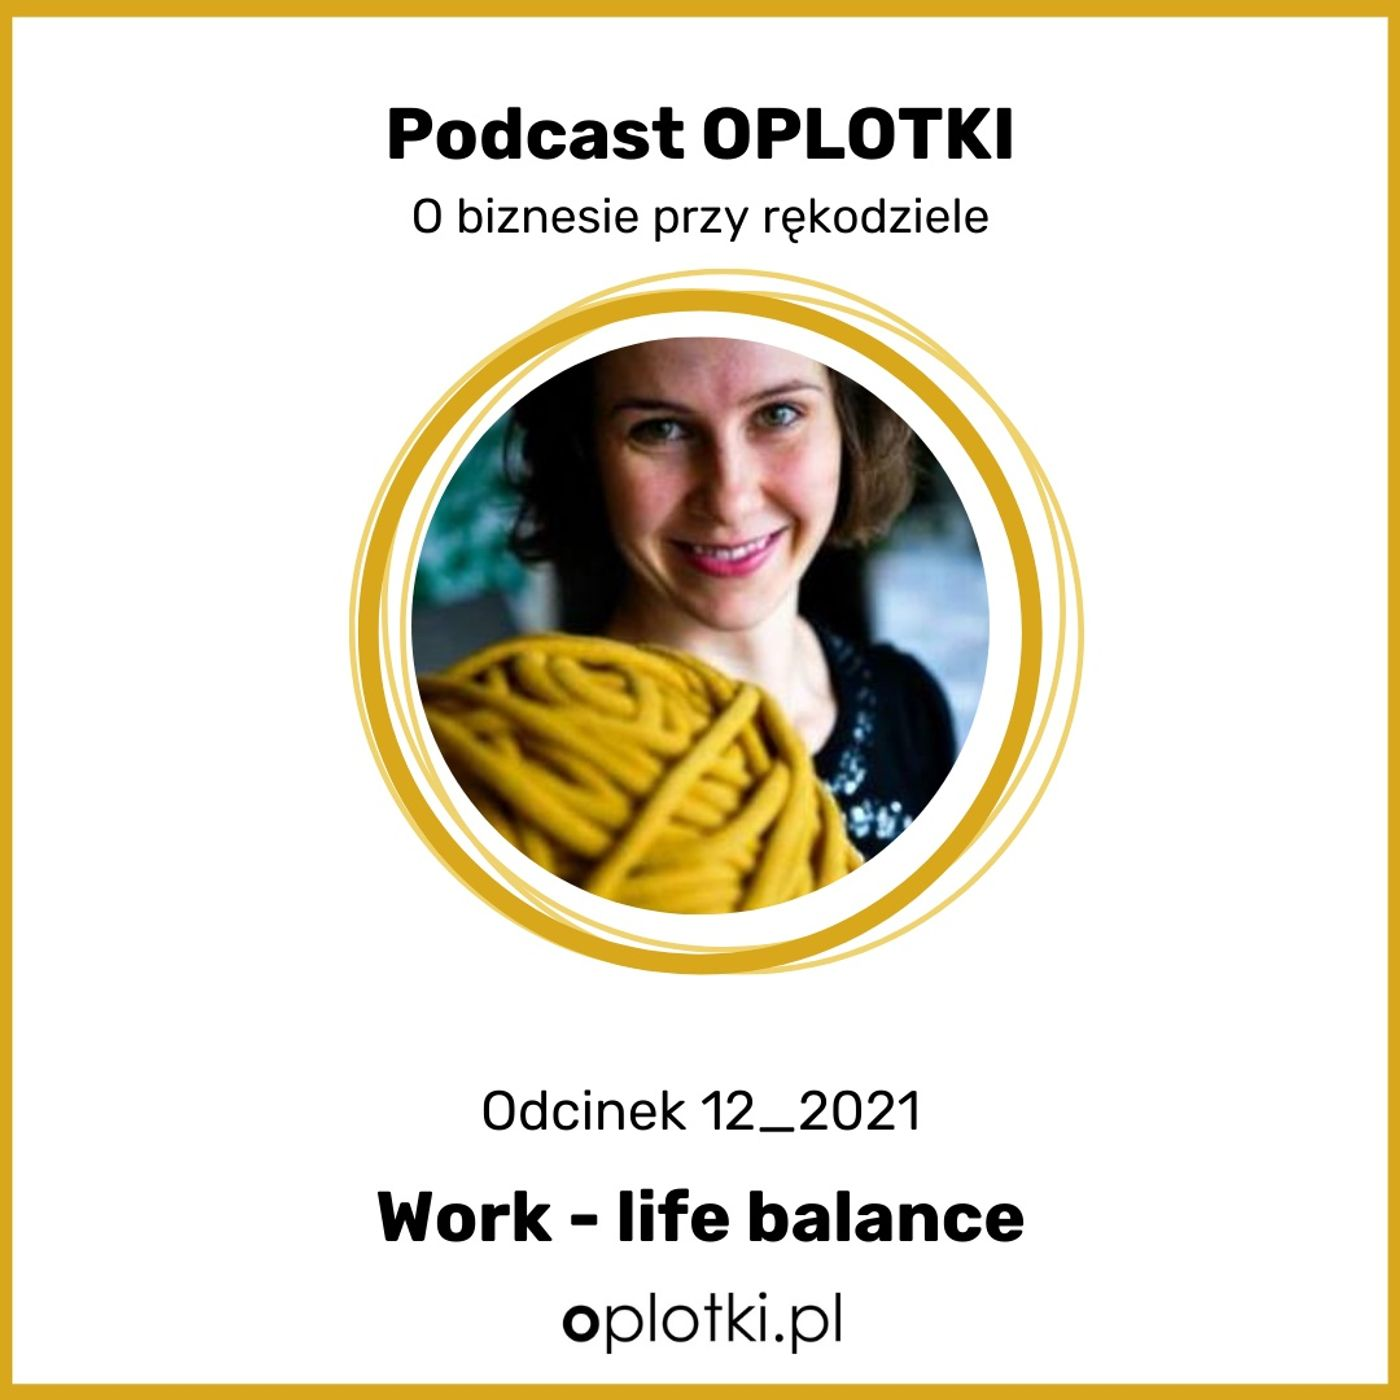 12_2021 Work-life balance